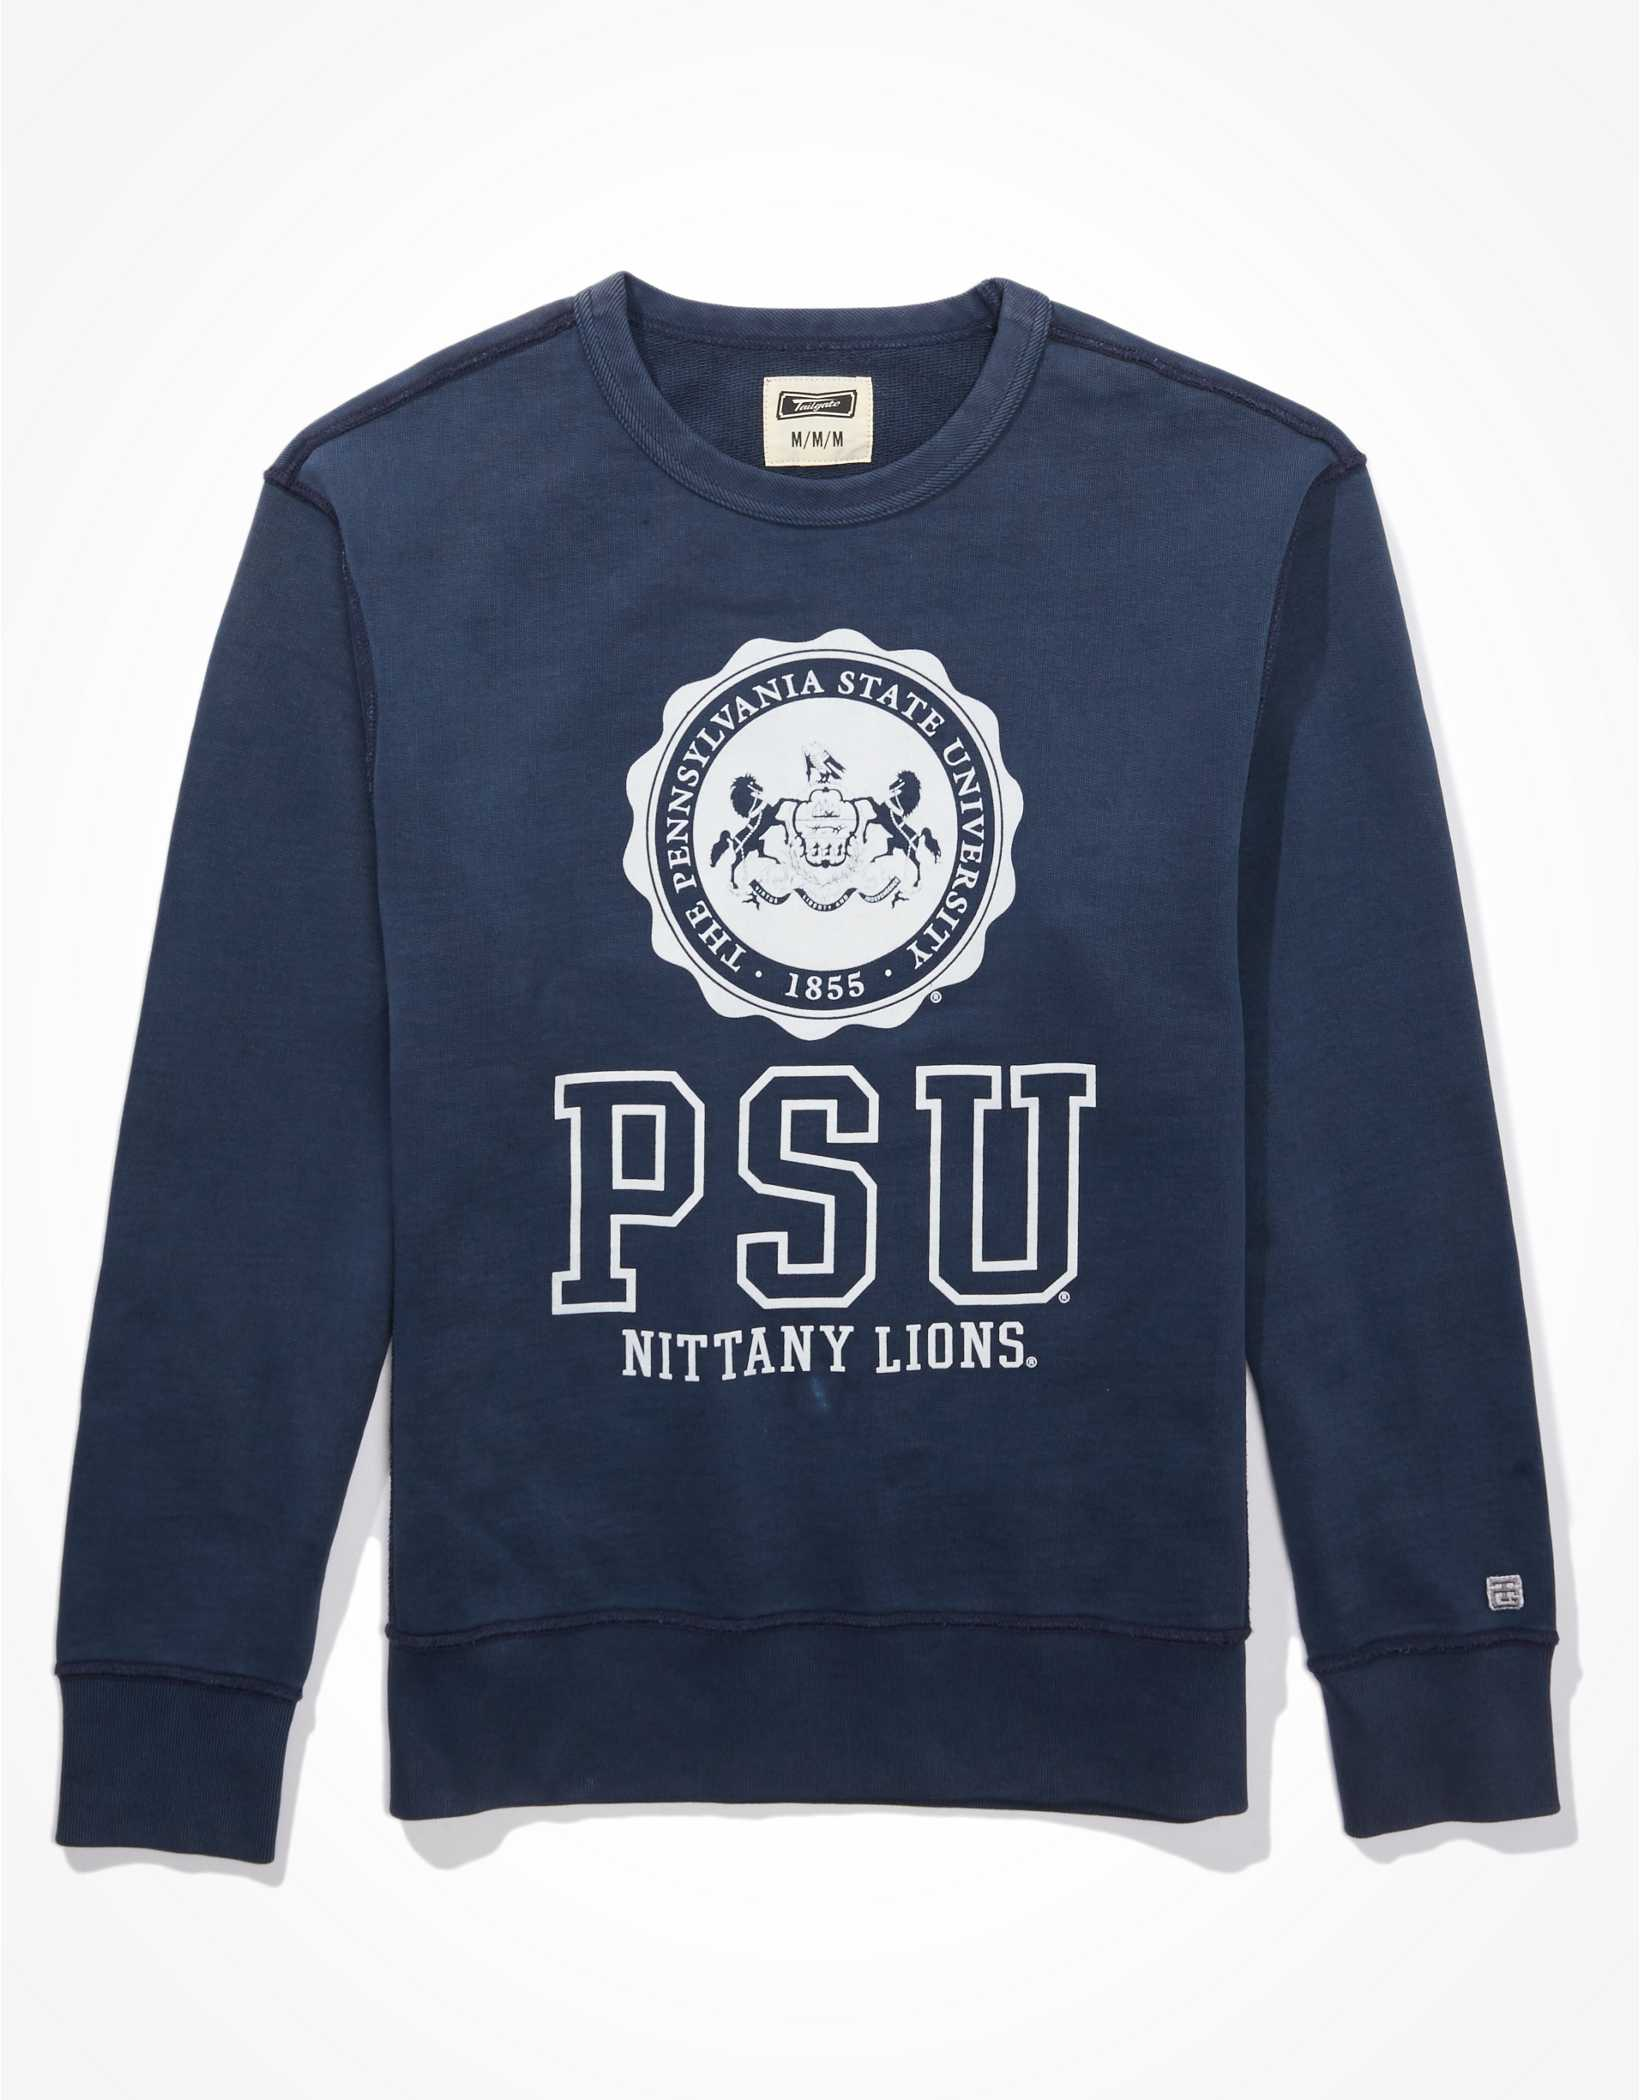 Tailgate Men's PSU Nittany Lions Terry Fleece Sweatshirt